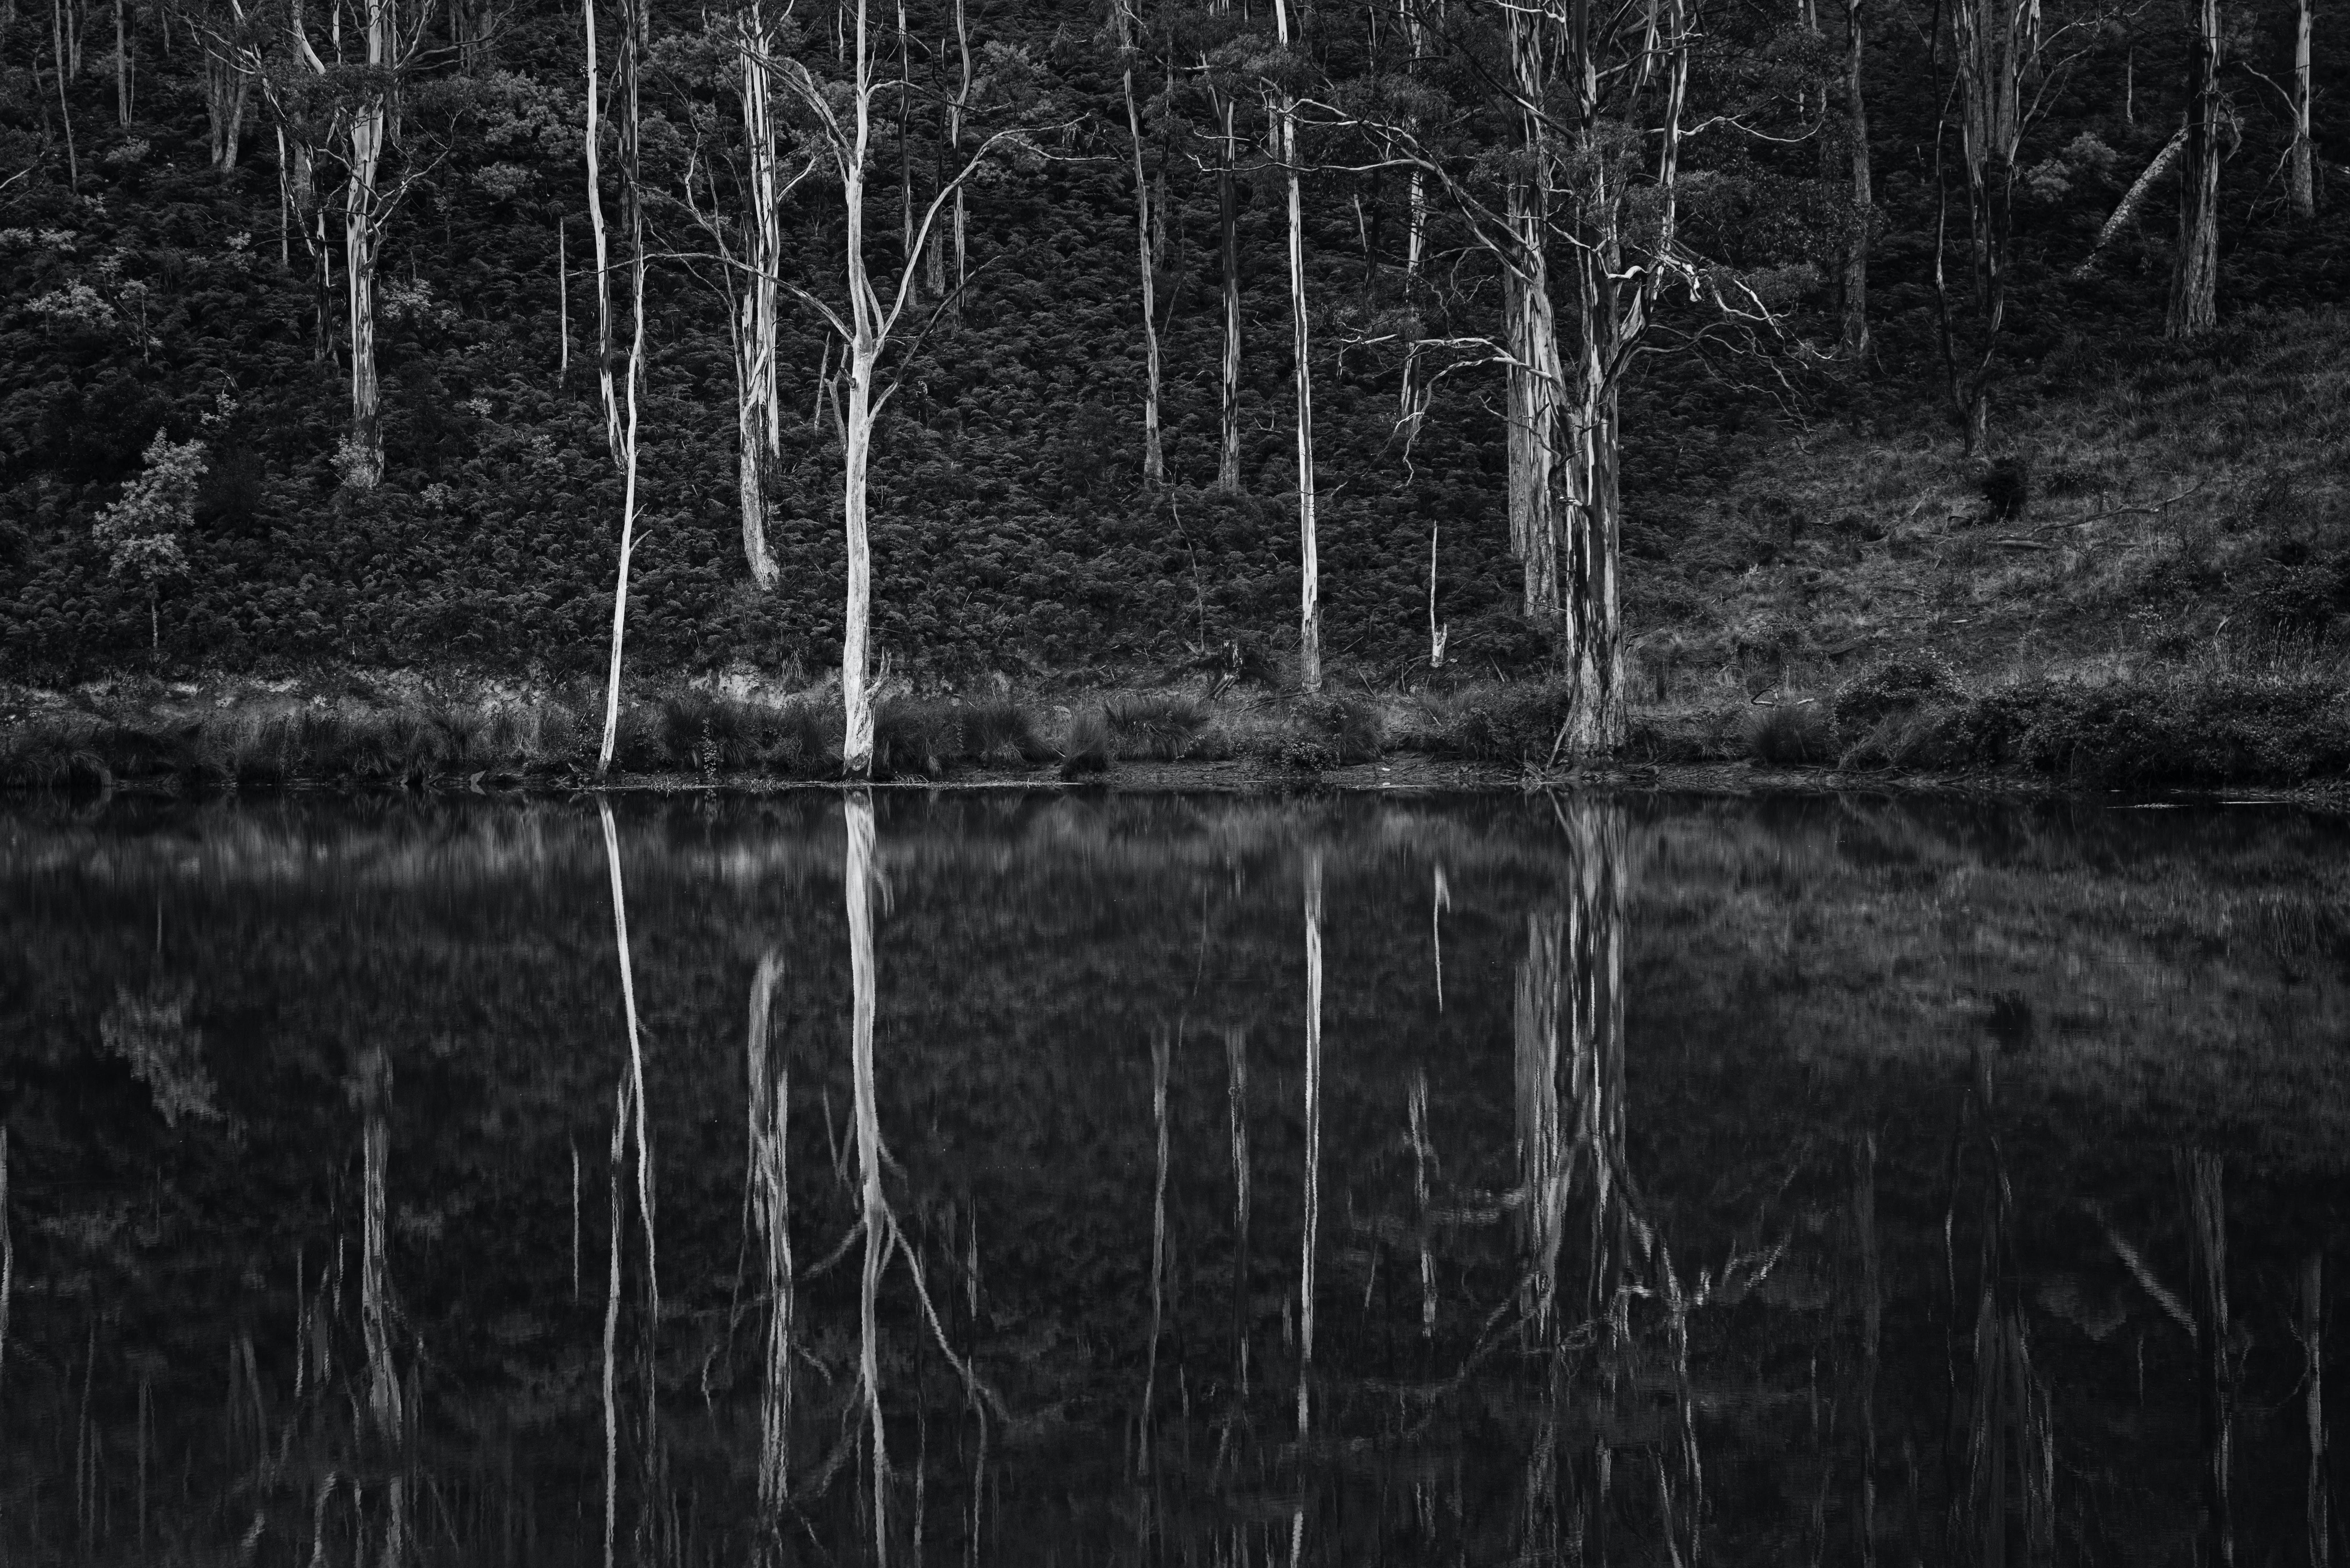 Kostenloses Stock Foto zu australien, baum, bäume, dunkel